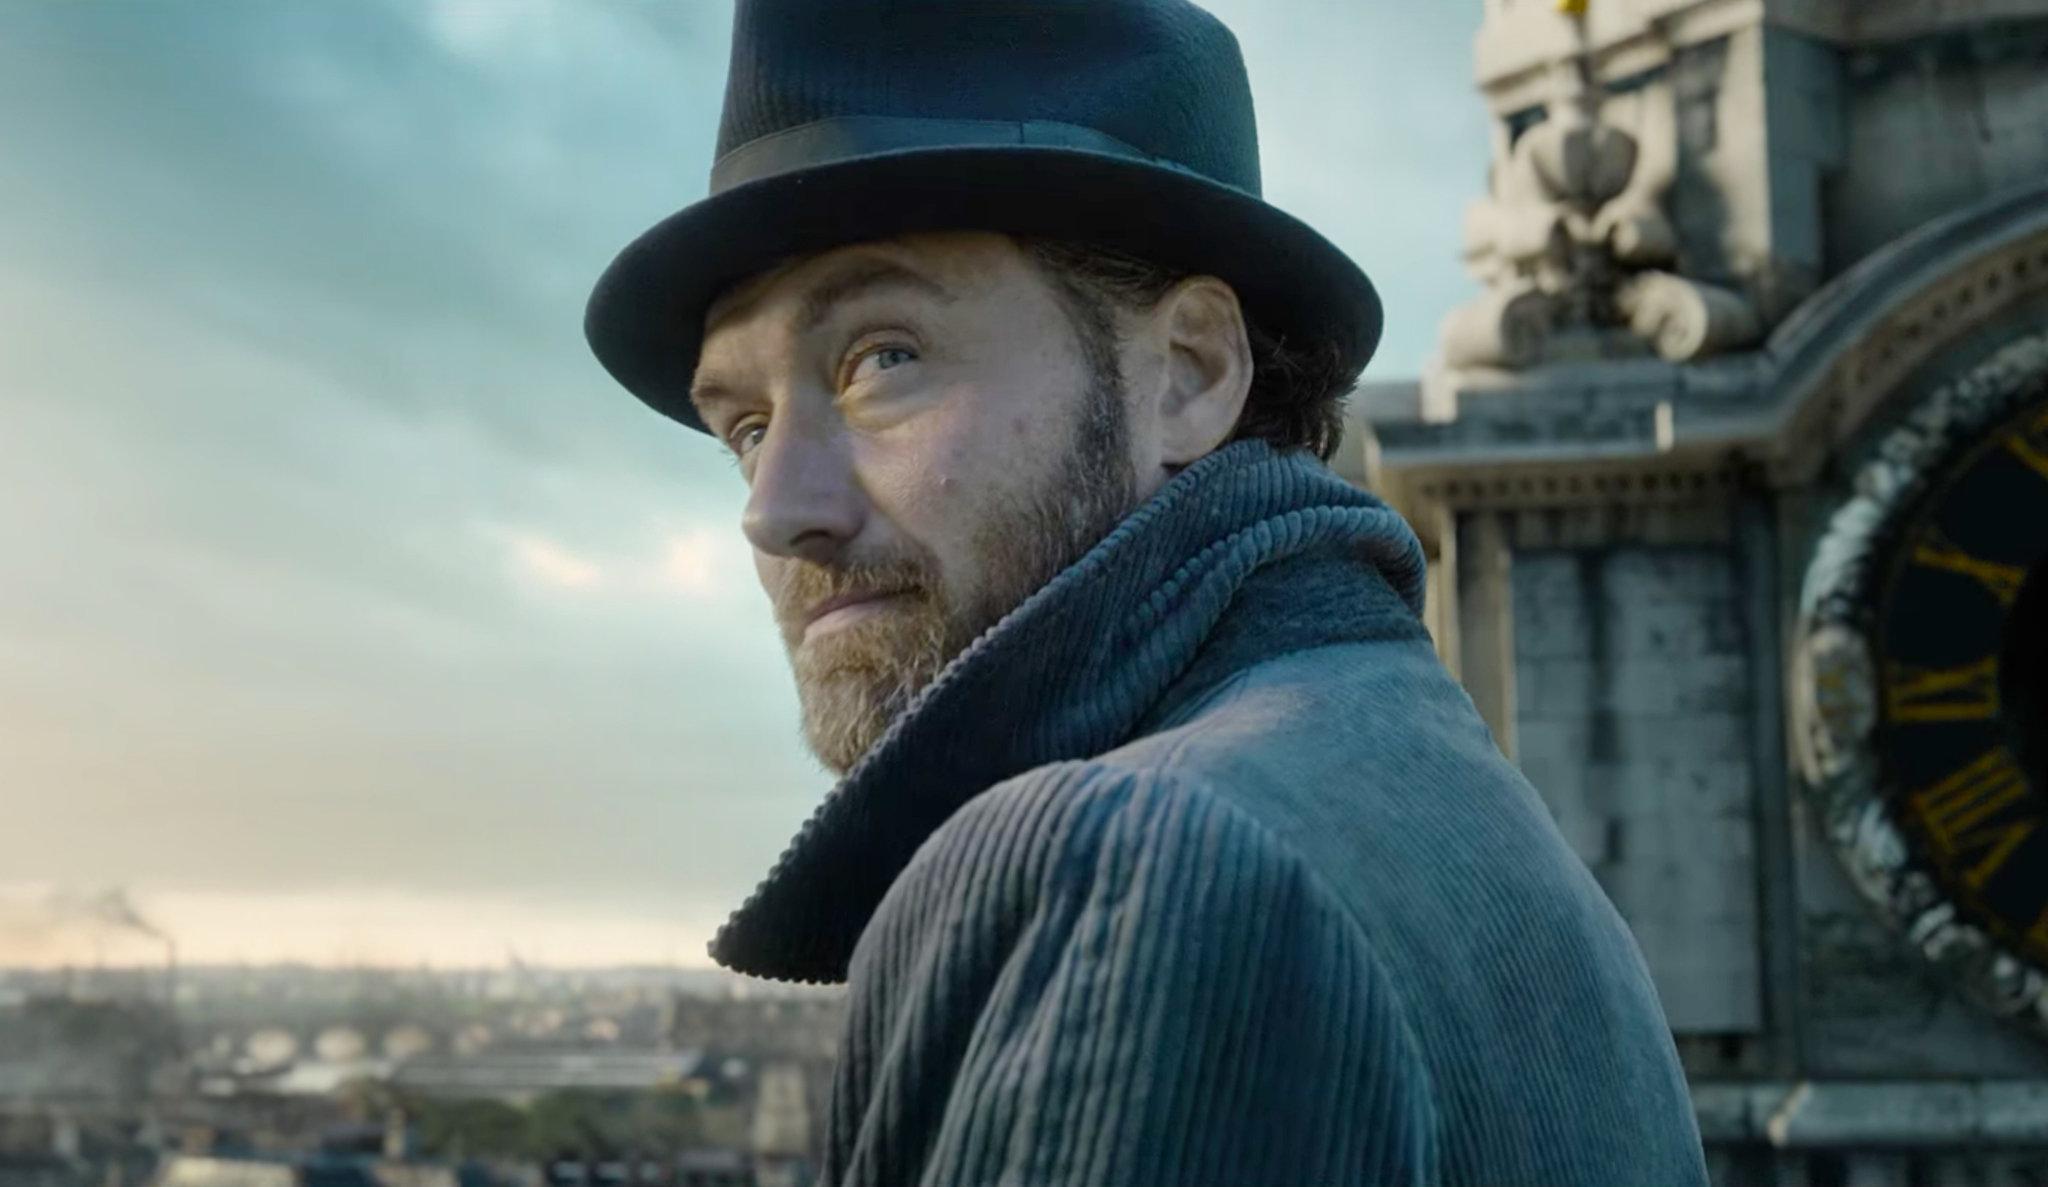 Джуд Лоу в образе Дамблдора на кадре из «Фантастических тварей 2»